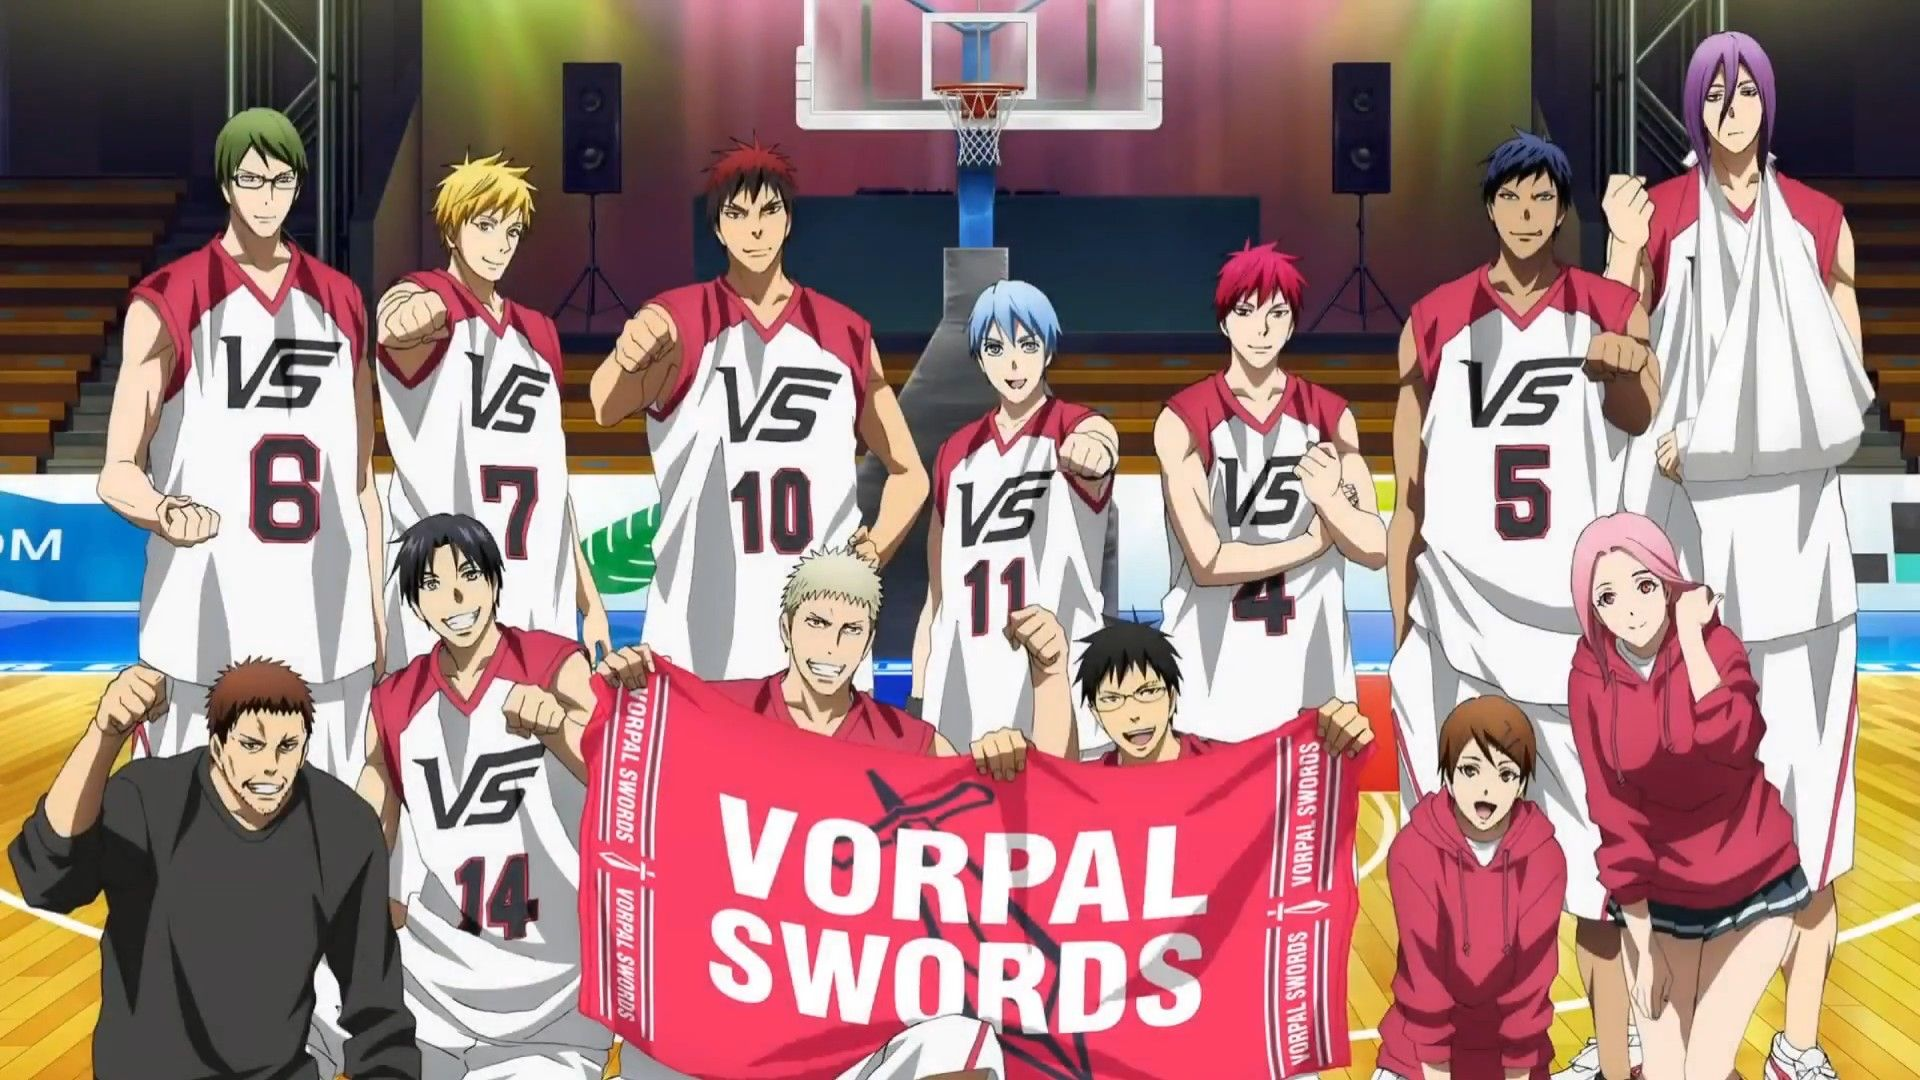 fefe865b7cf27160000dfbc3bba575e6 - Kuroko no Basket: Last Game [HD 720p] [Sub. Español] [Mega] - Anime no Ligero [Descargas]